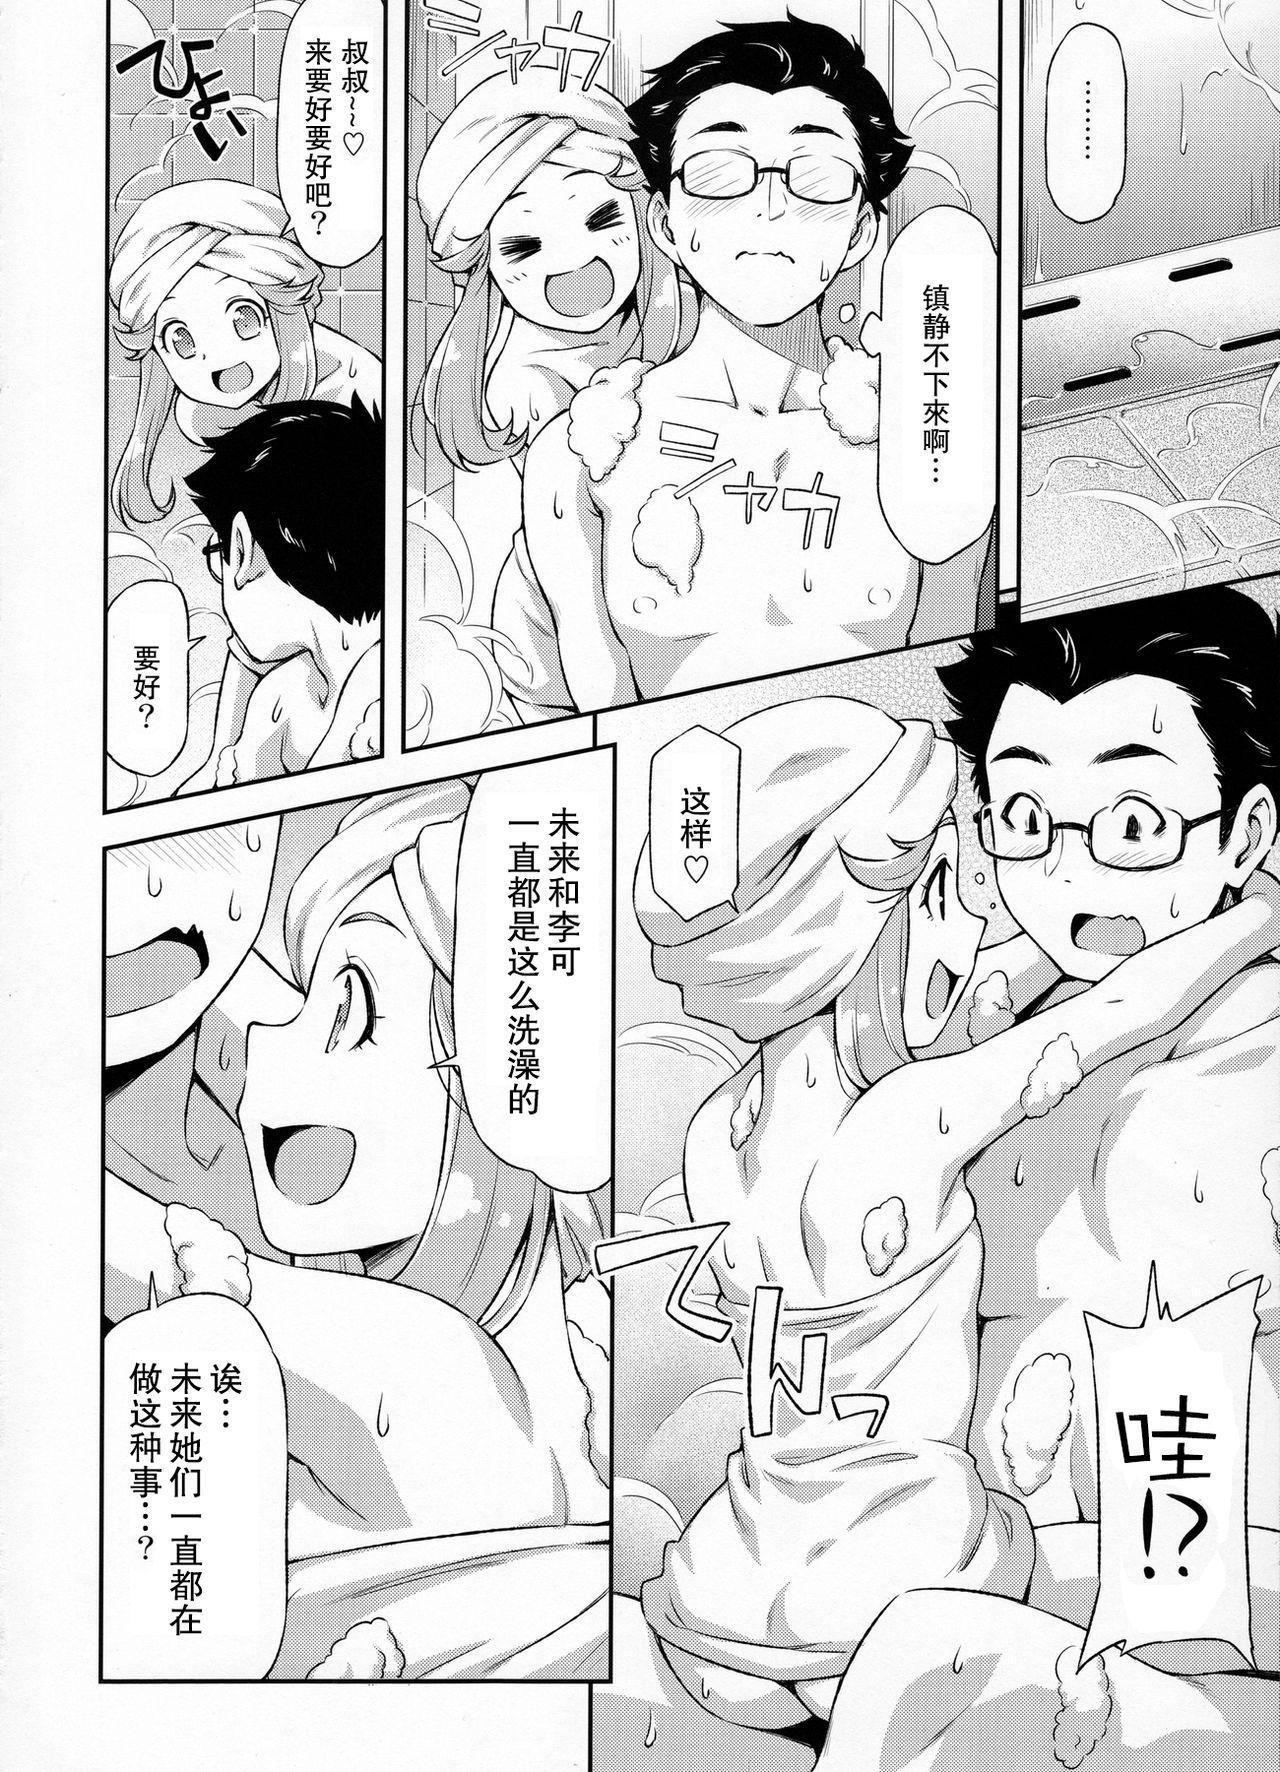 (C91) [ACID EATERS (Kazuma Muramasa)] Haa-chan to Furo ni Haireba. (Mahou Tsukai Precure!)(Chinese) 7